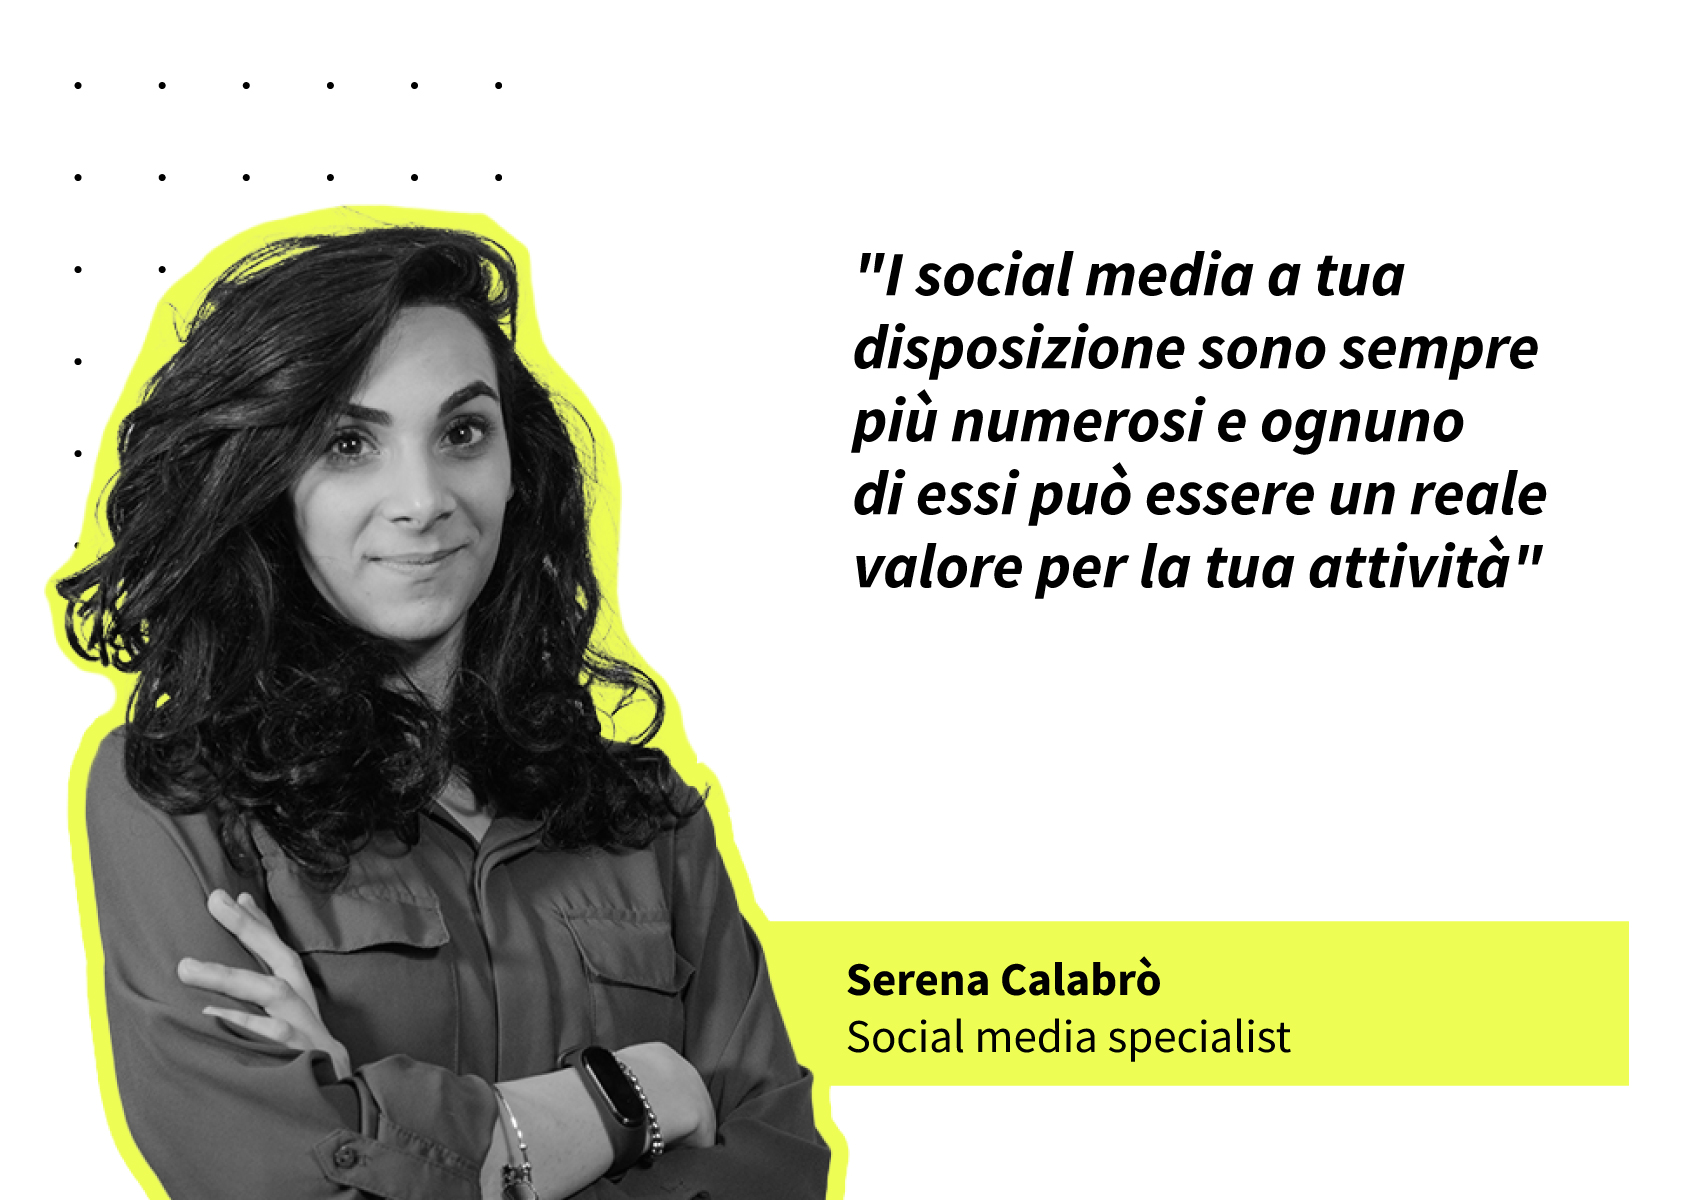 Blog-post-SOCIAL-MEDIA-CHECKLIST-2021-quote-Serena